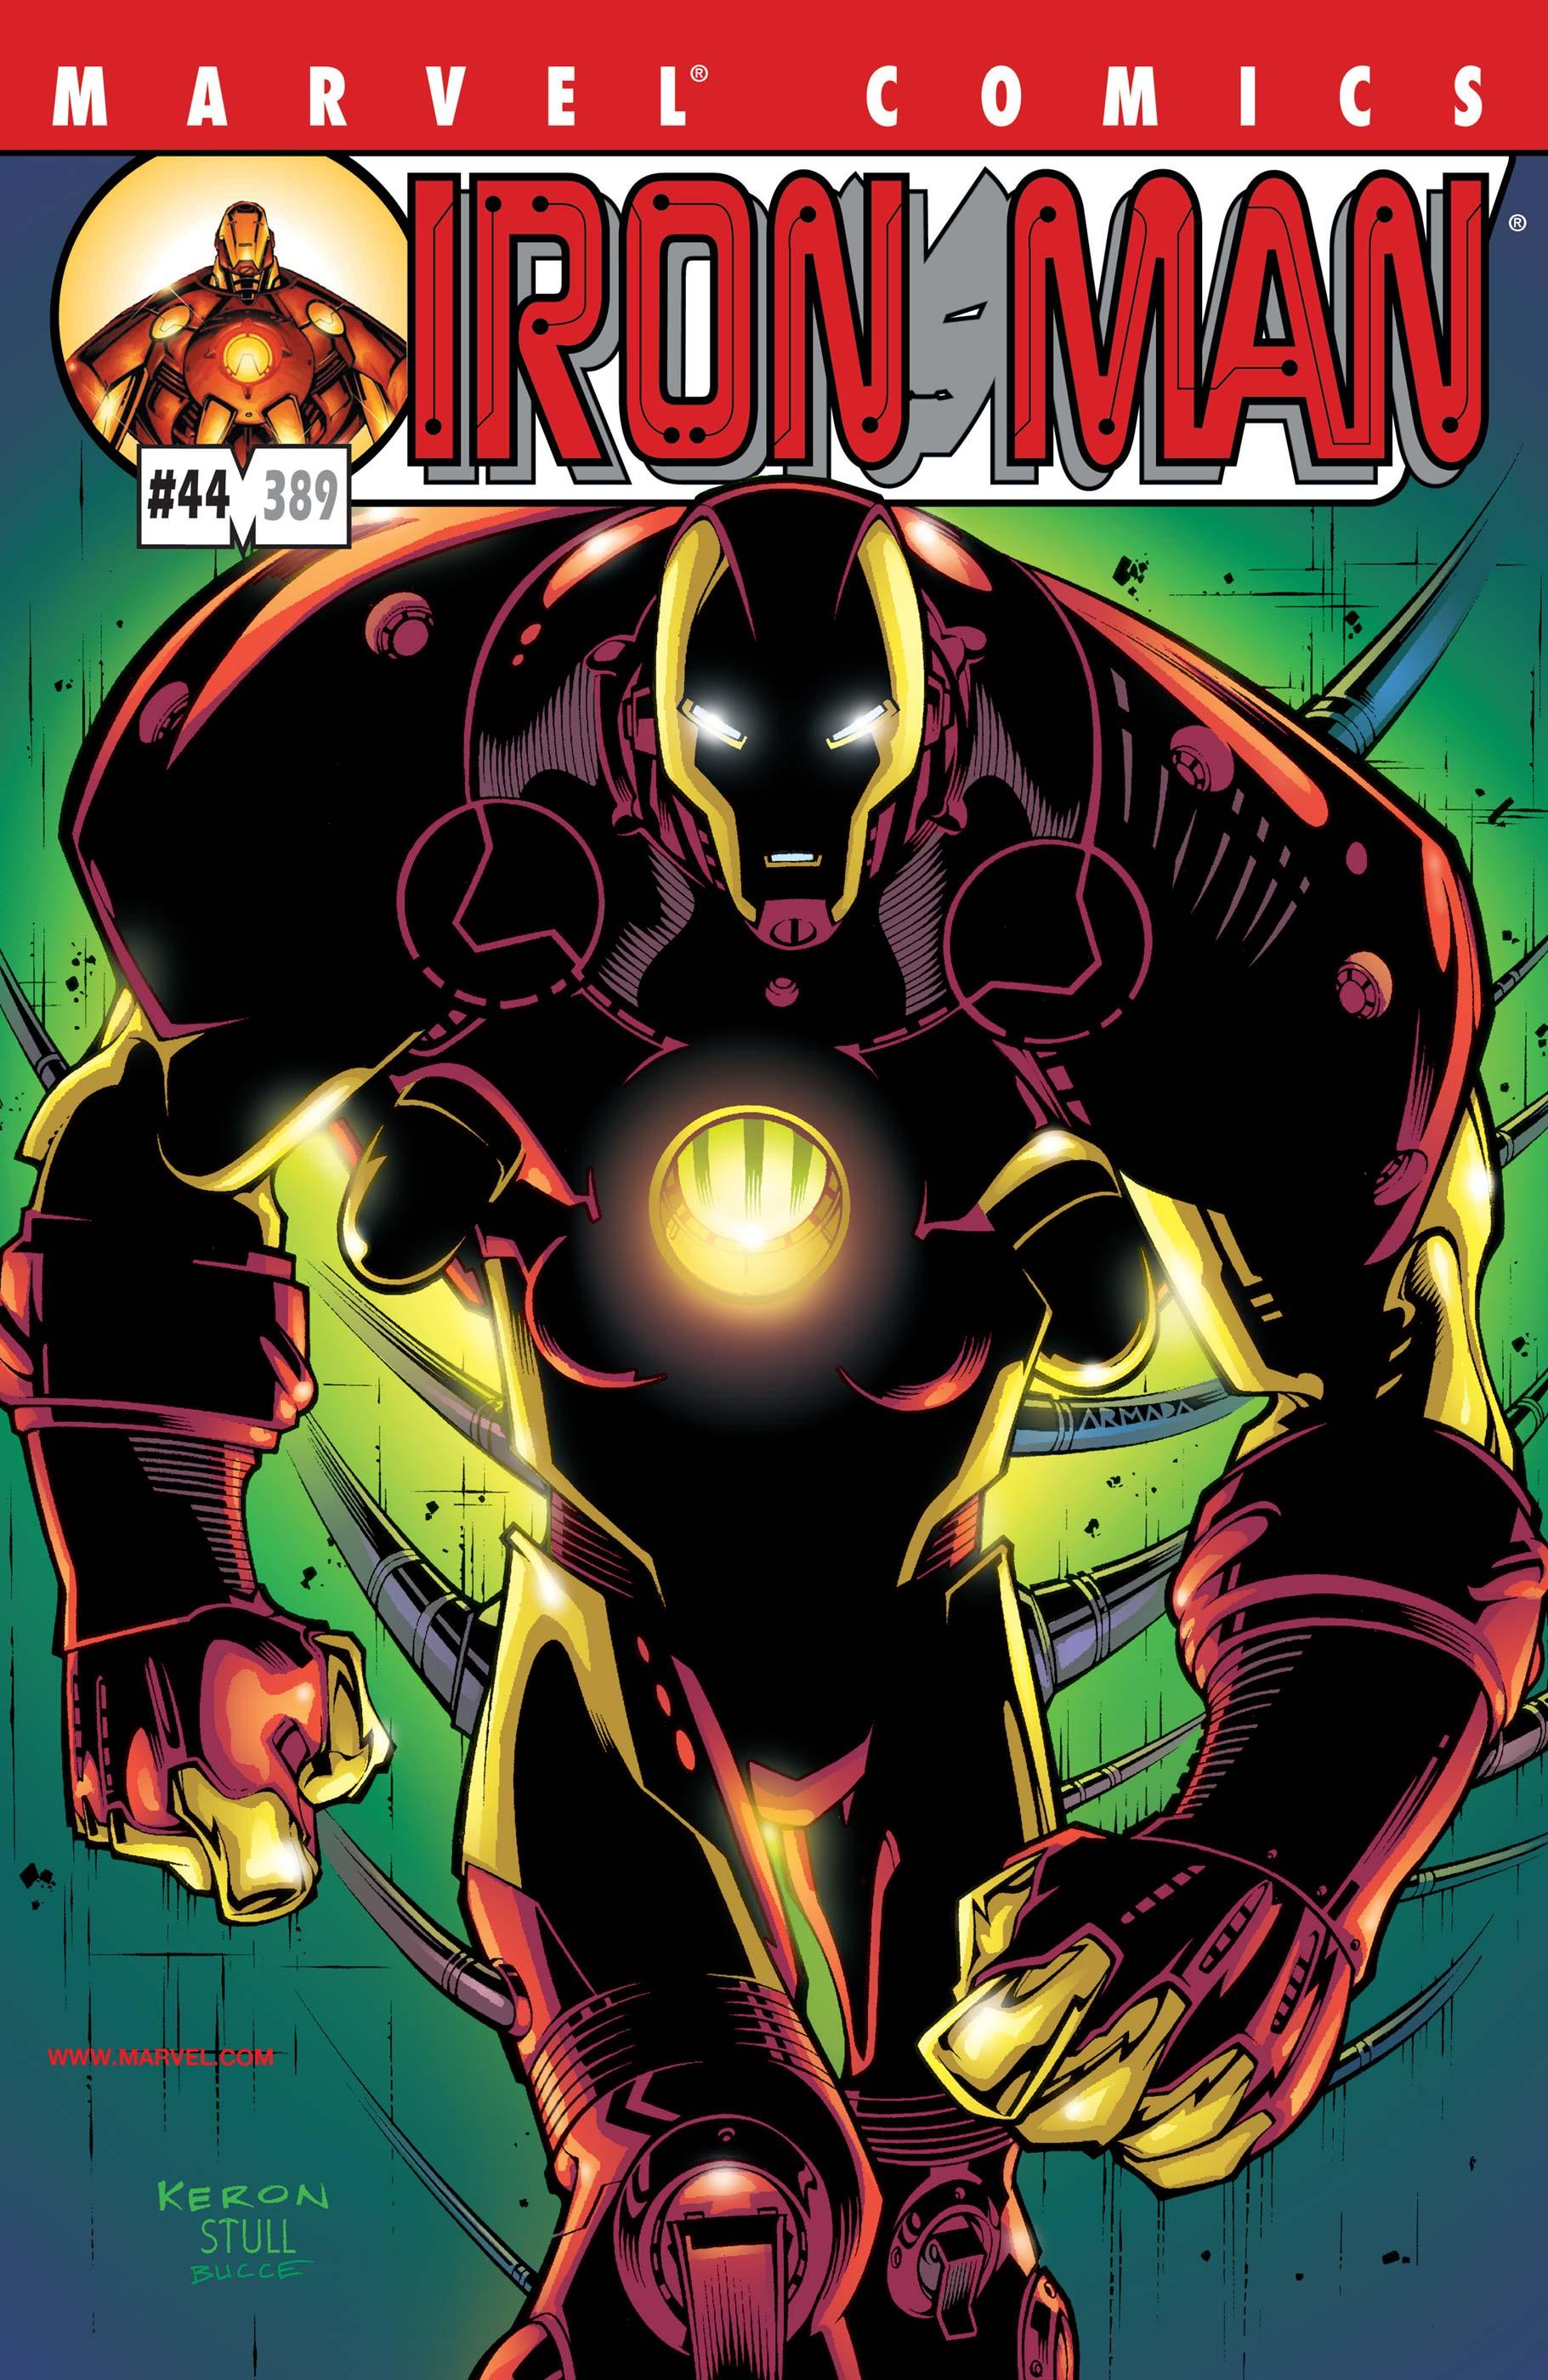 Iron Man (1998) #44